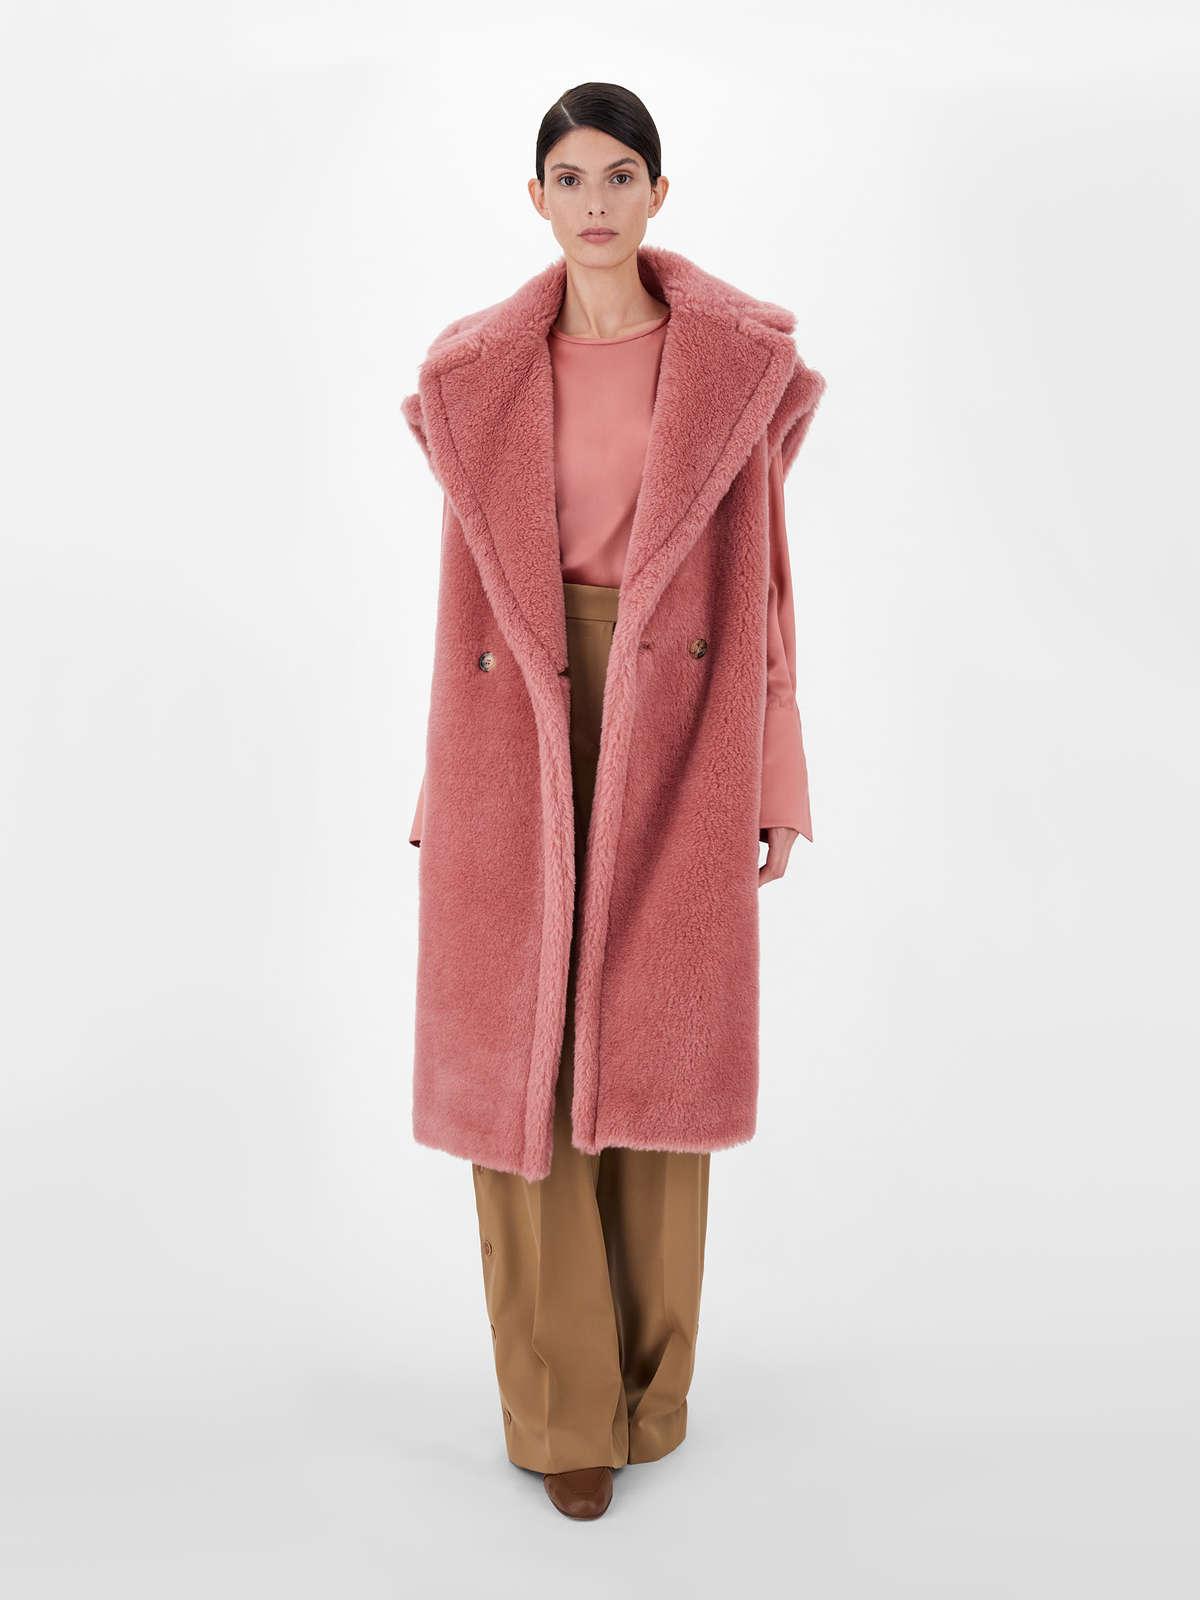 Teddy vest in alpaca and wool - Max Mara